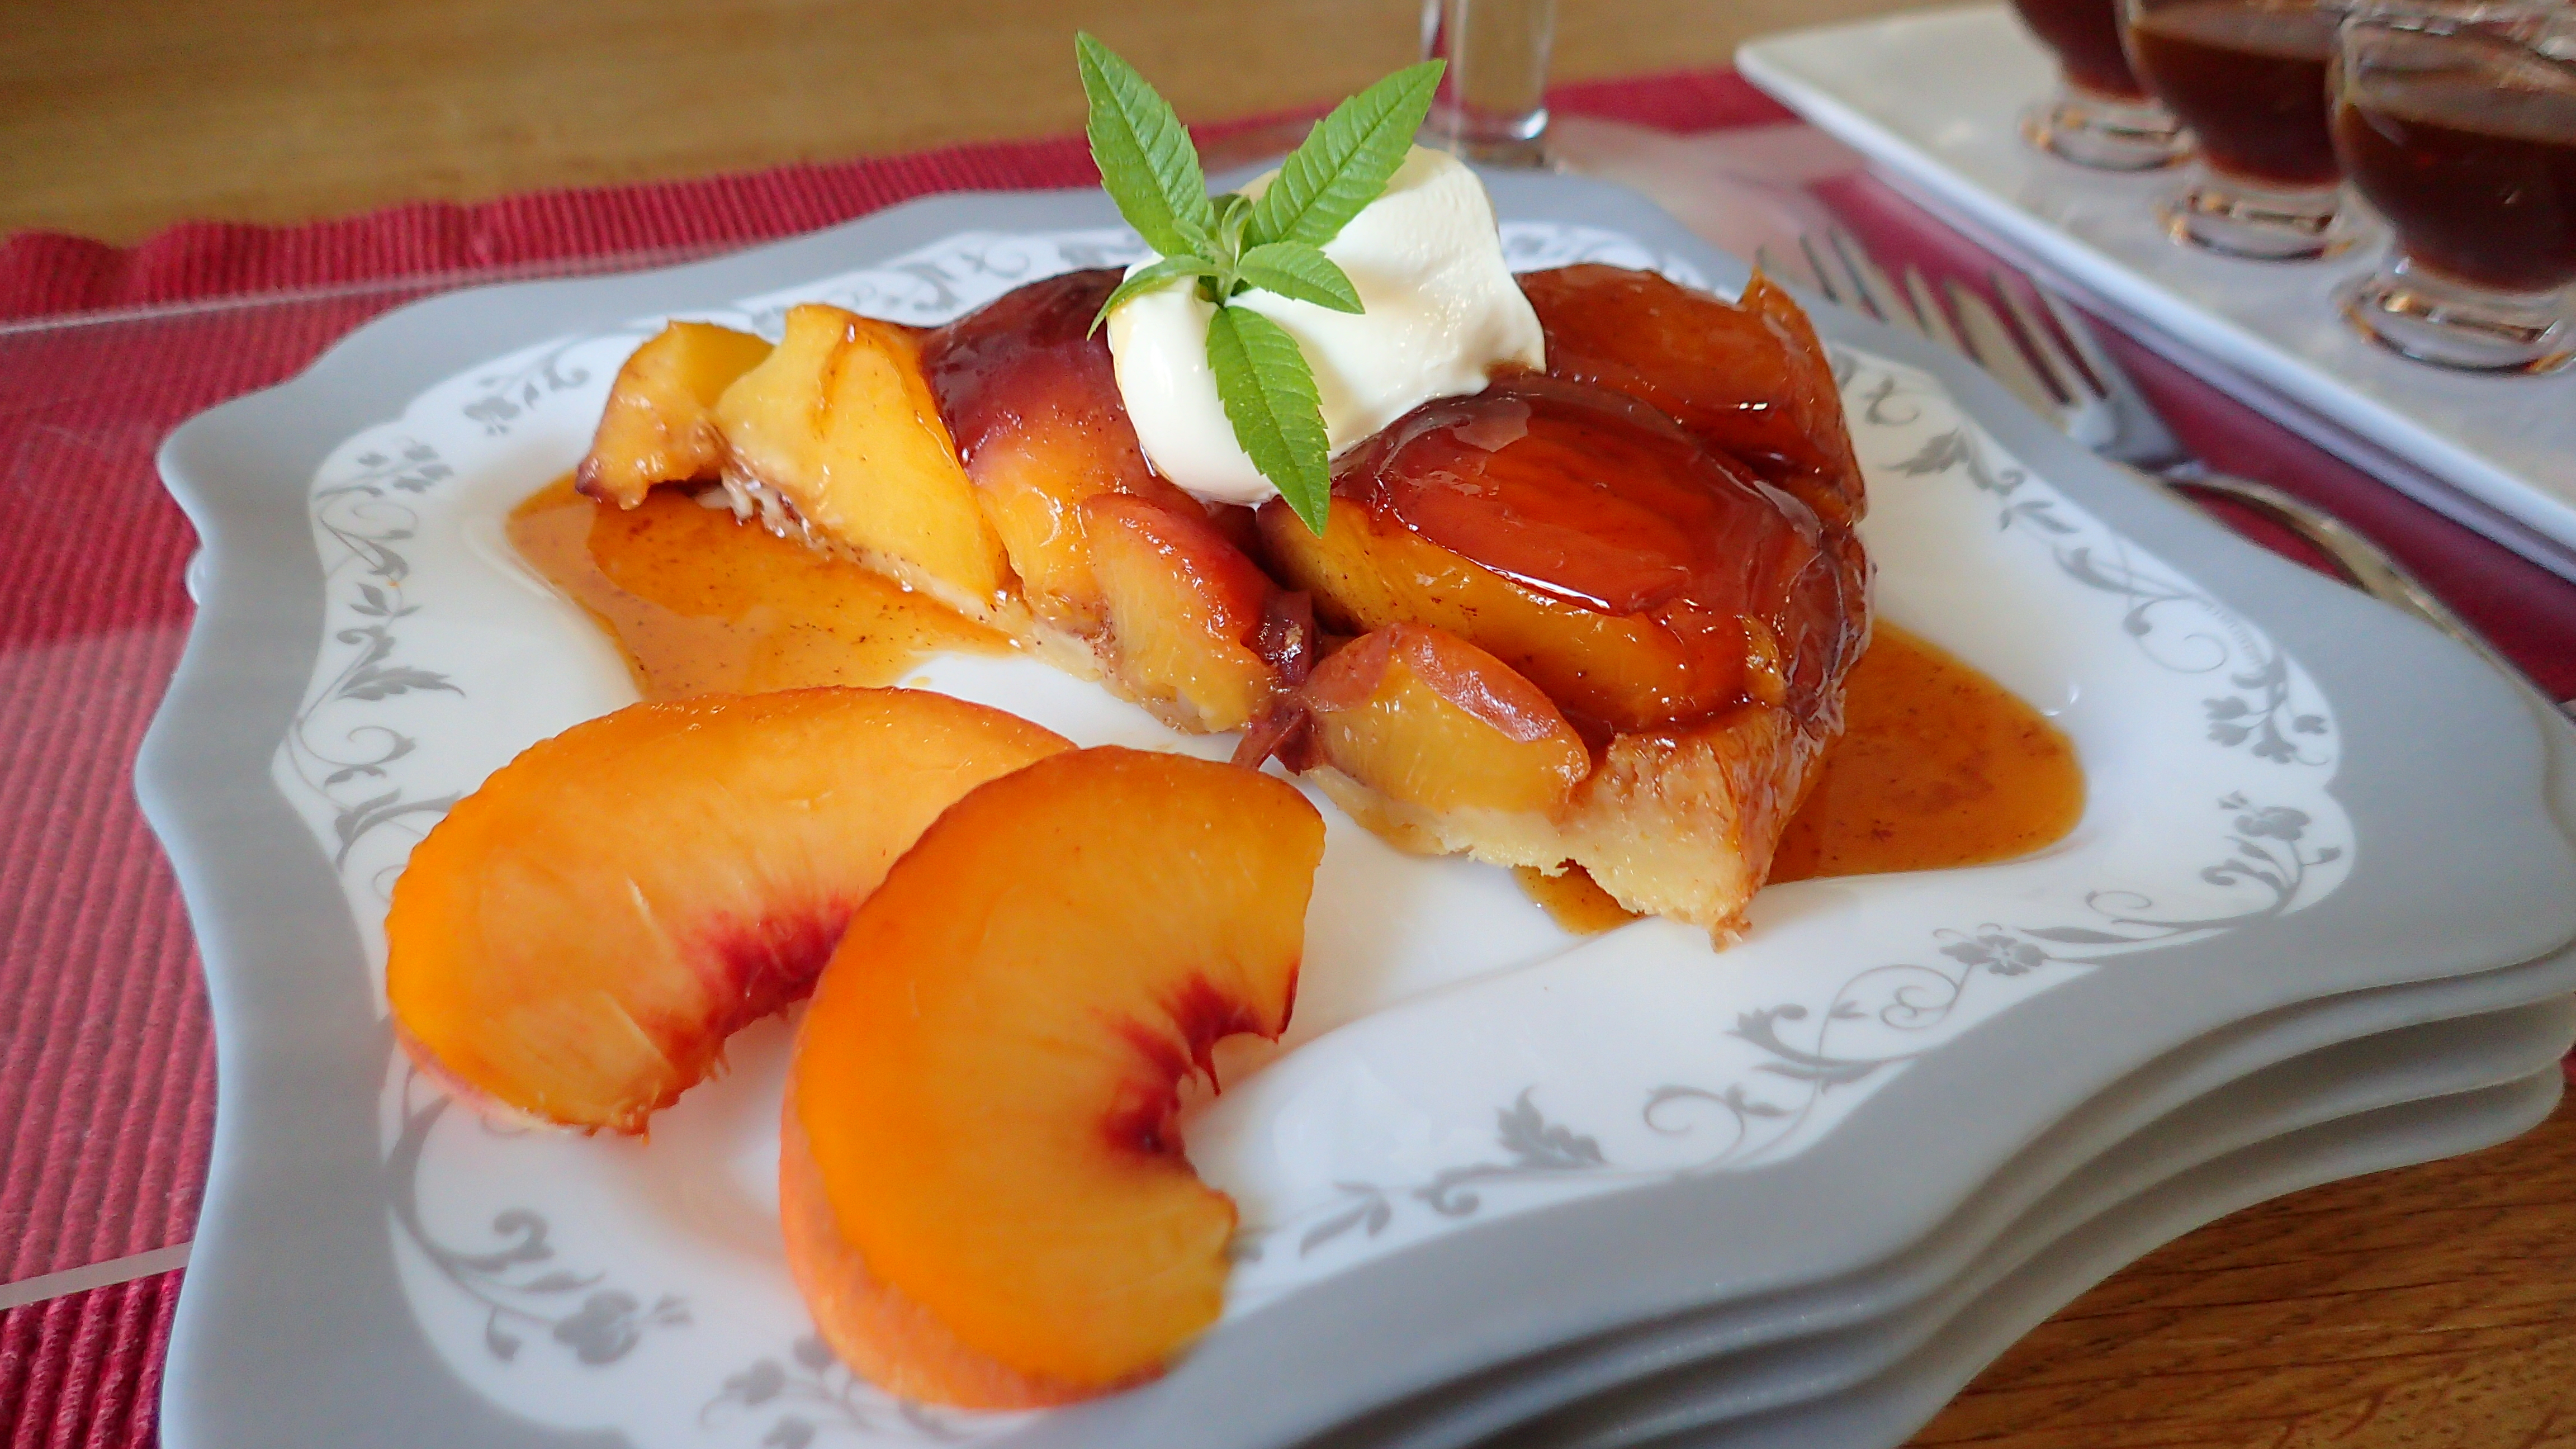 Tarte tatin aux pêches (Peaches Tart Tatin)